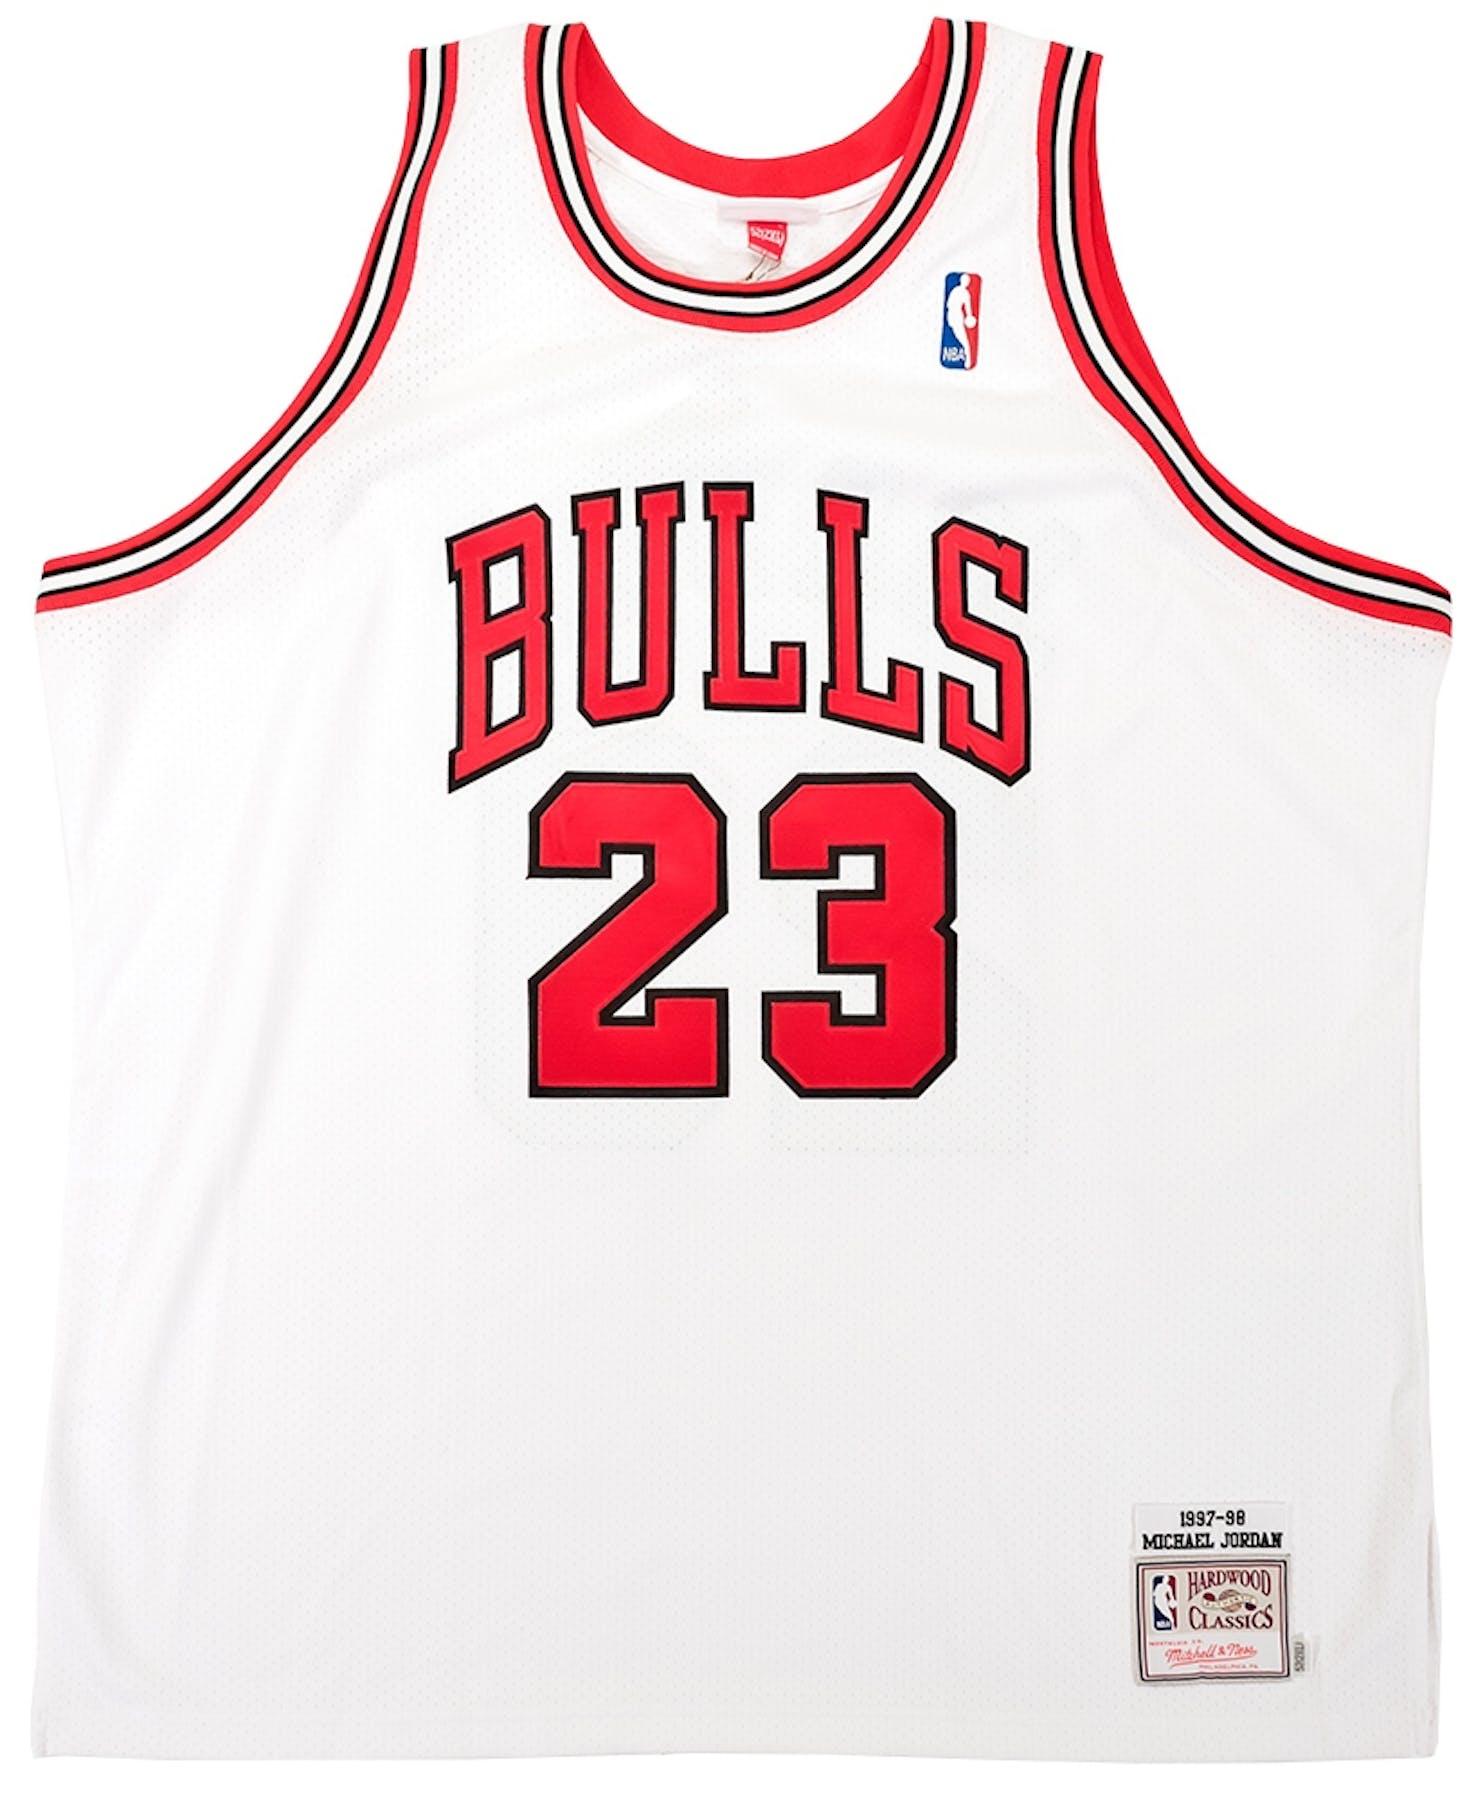 f75bdd4b742ee1 Michael Jordan Autographed Chicago Bulls Basketball Jersey w ...